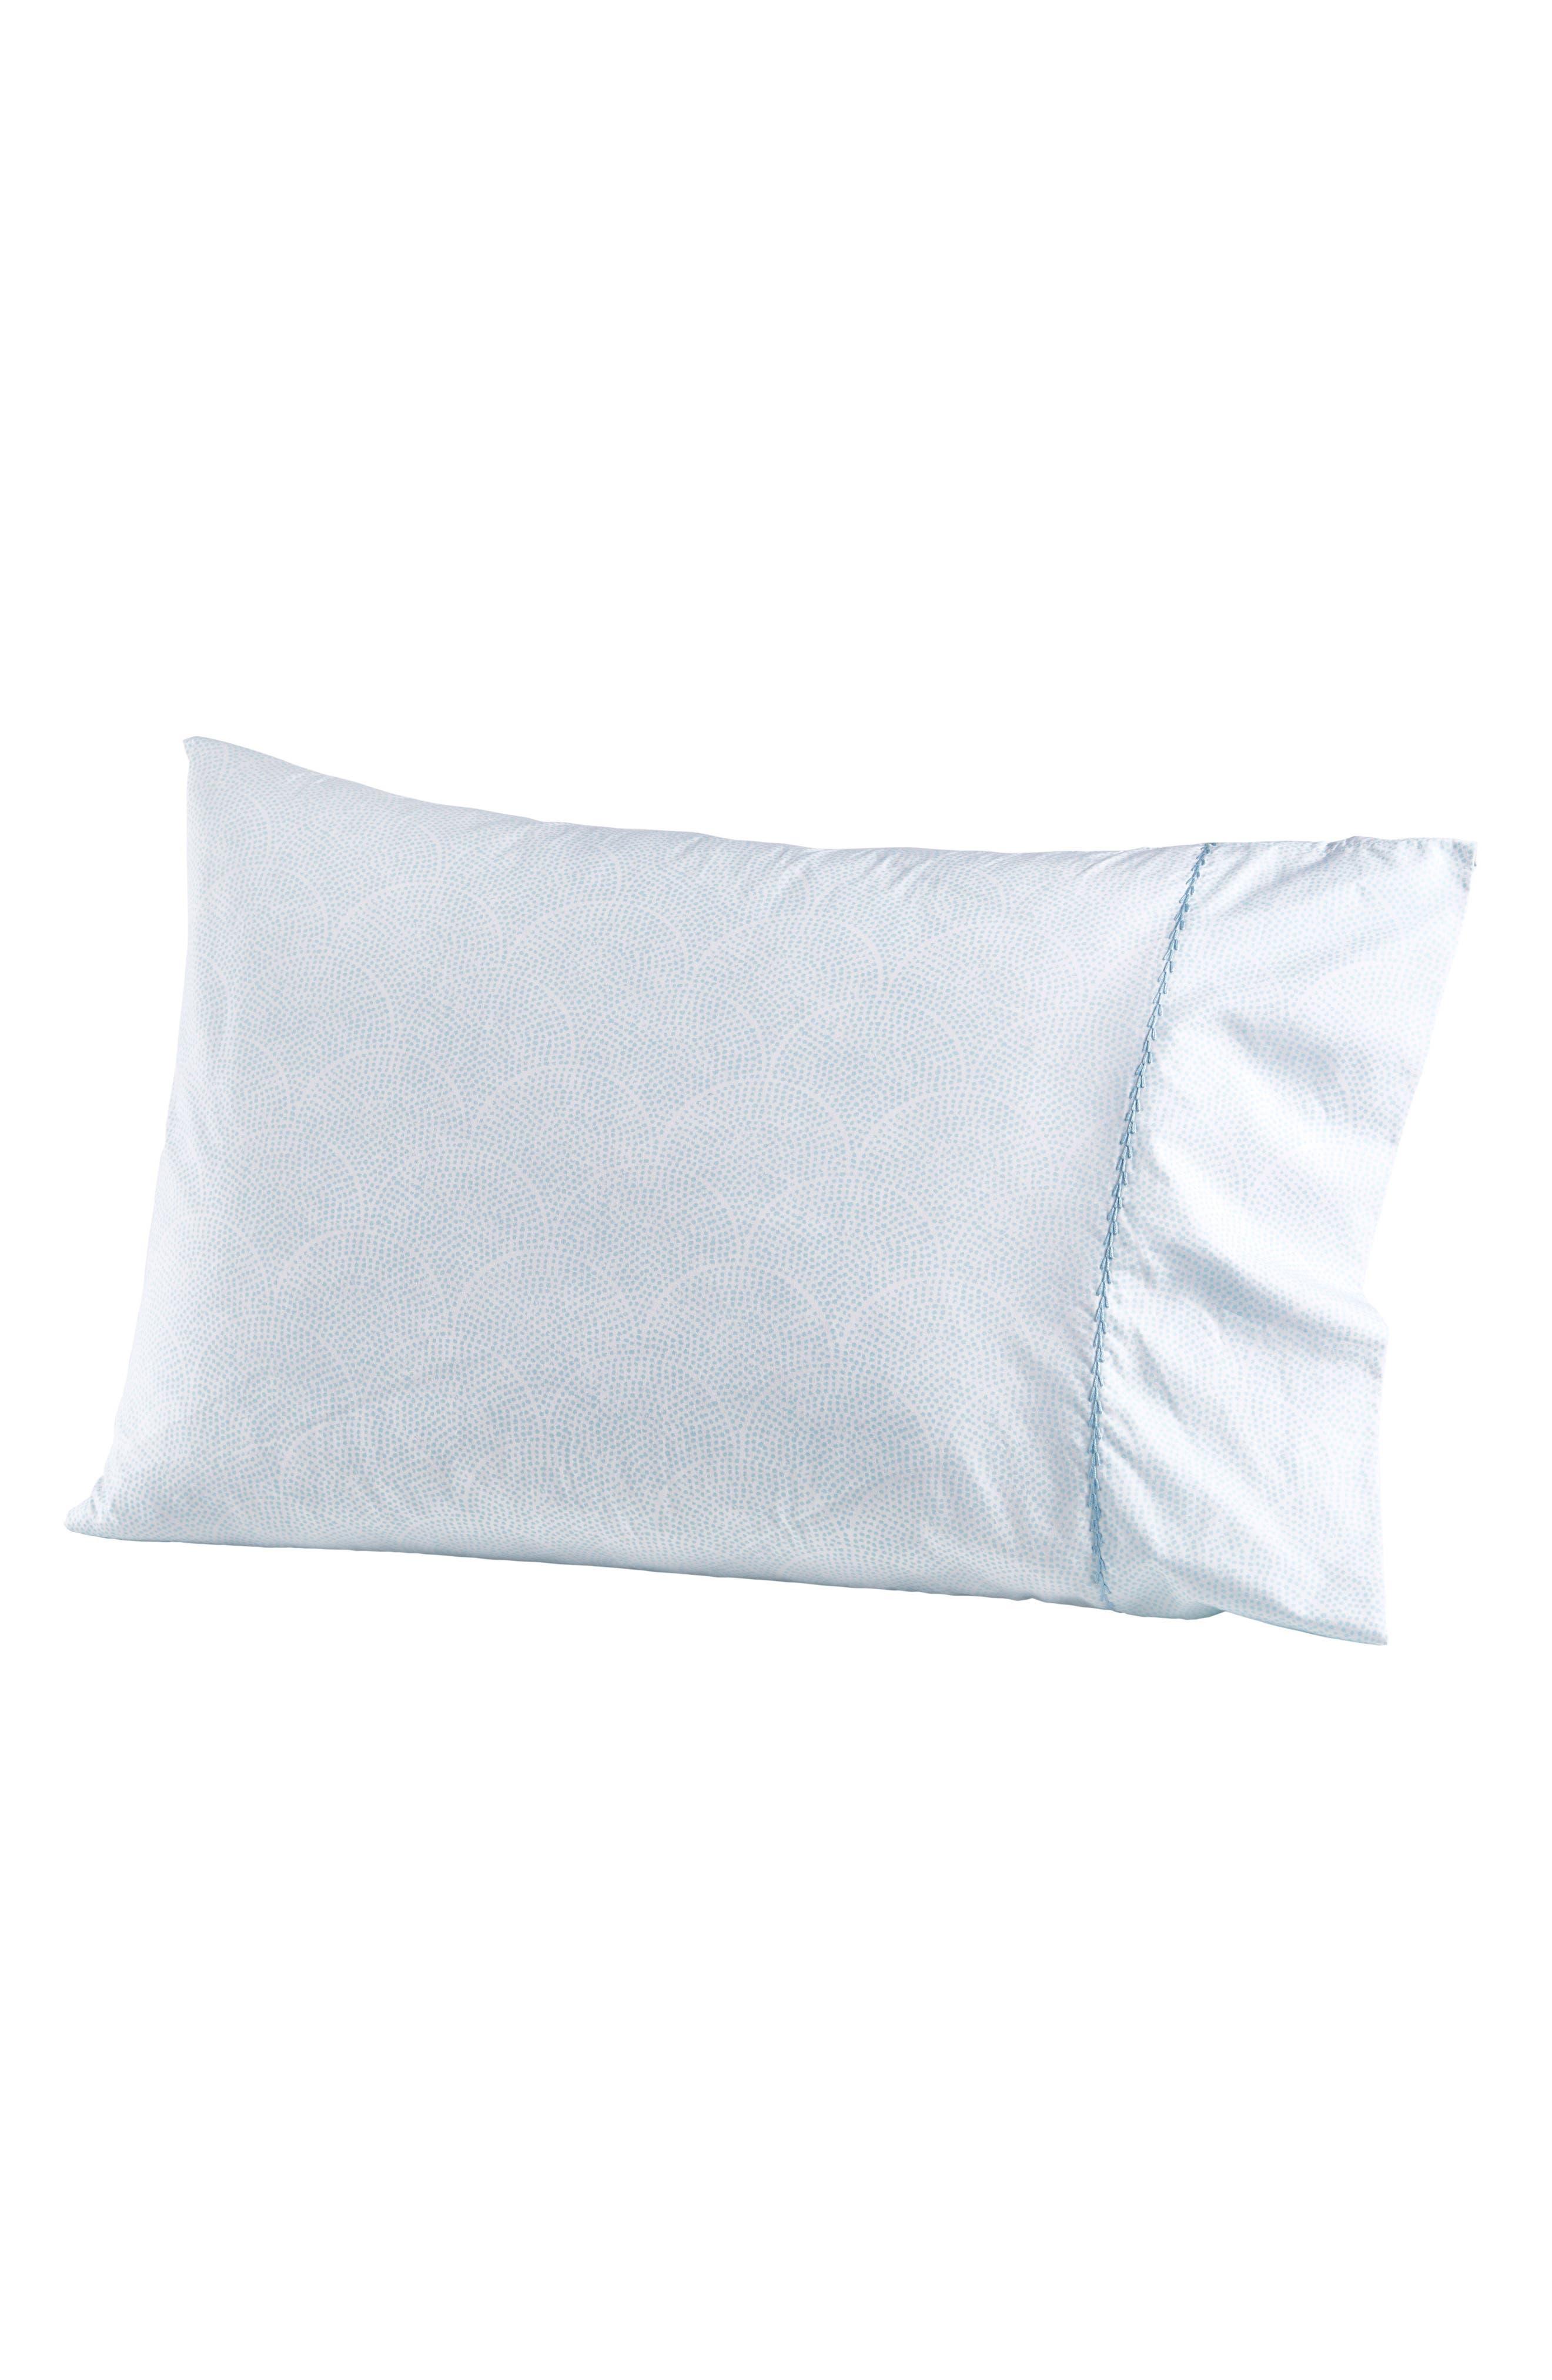 Vatula 400 Thread Count Pillowcases,                             Main thumbnail 1, color,                             100